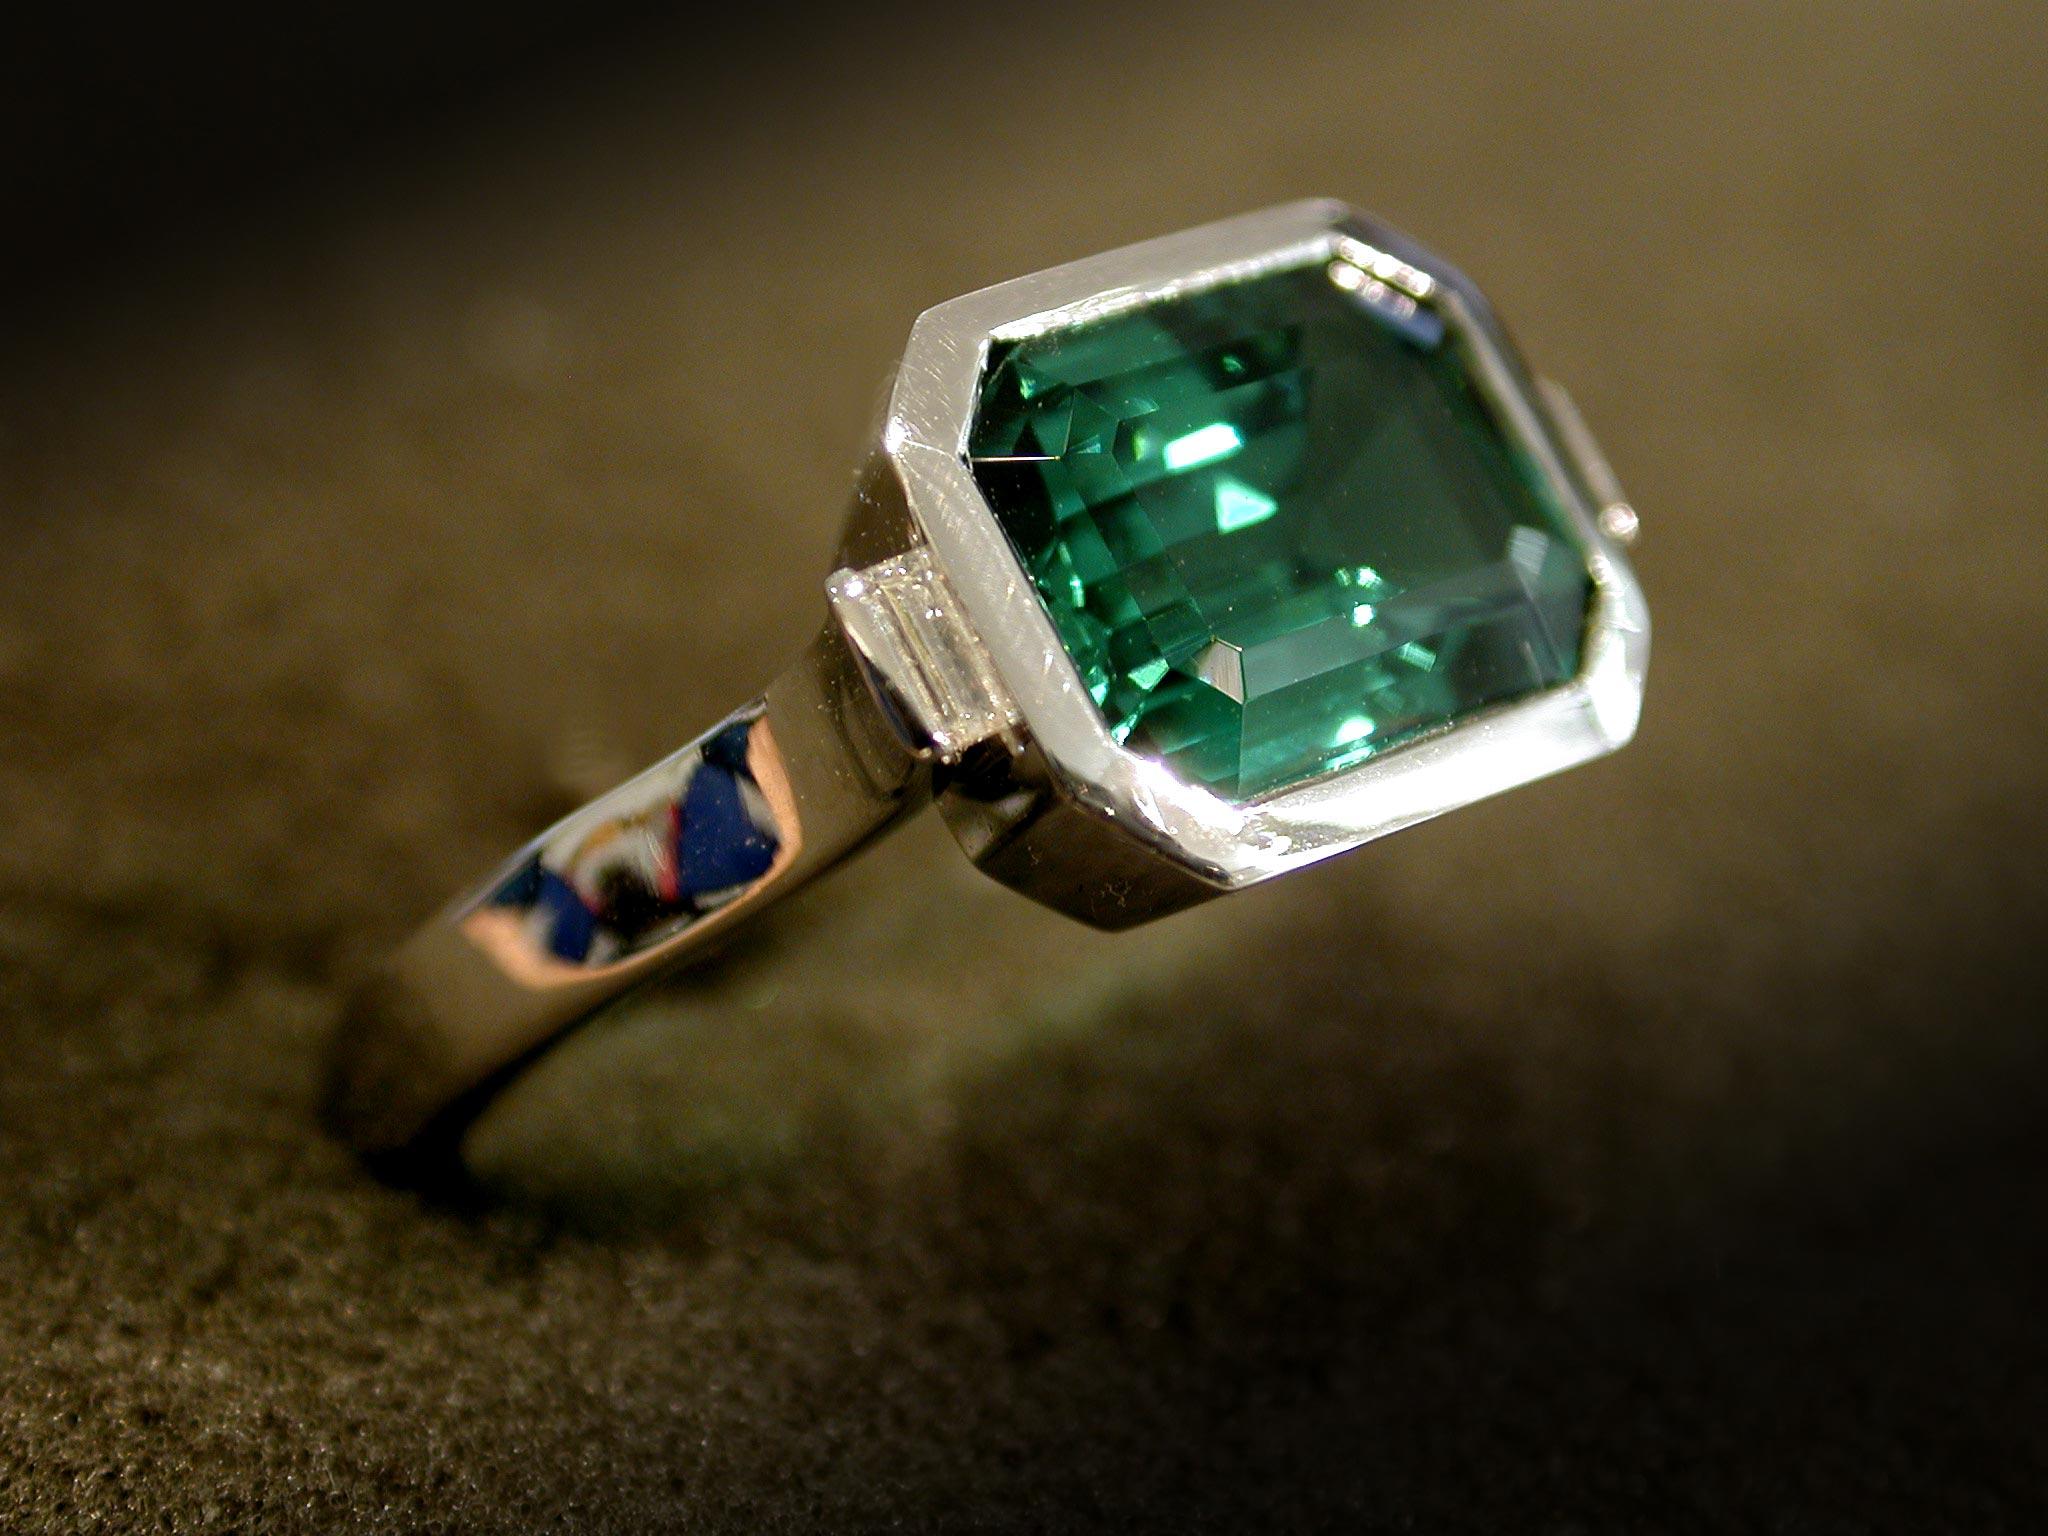 Verdelit (Turmalin) mit Diamant in Baguetteschliff